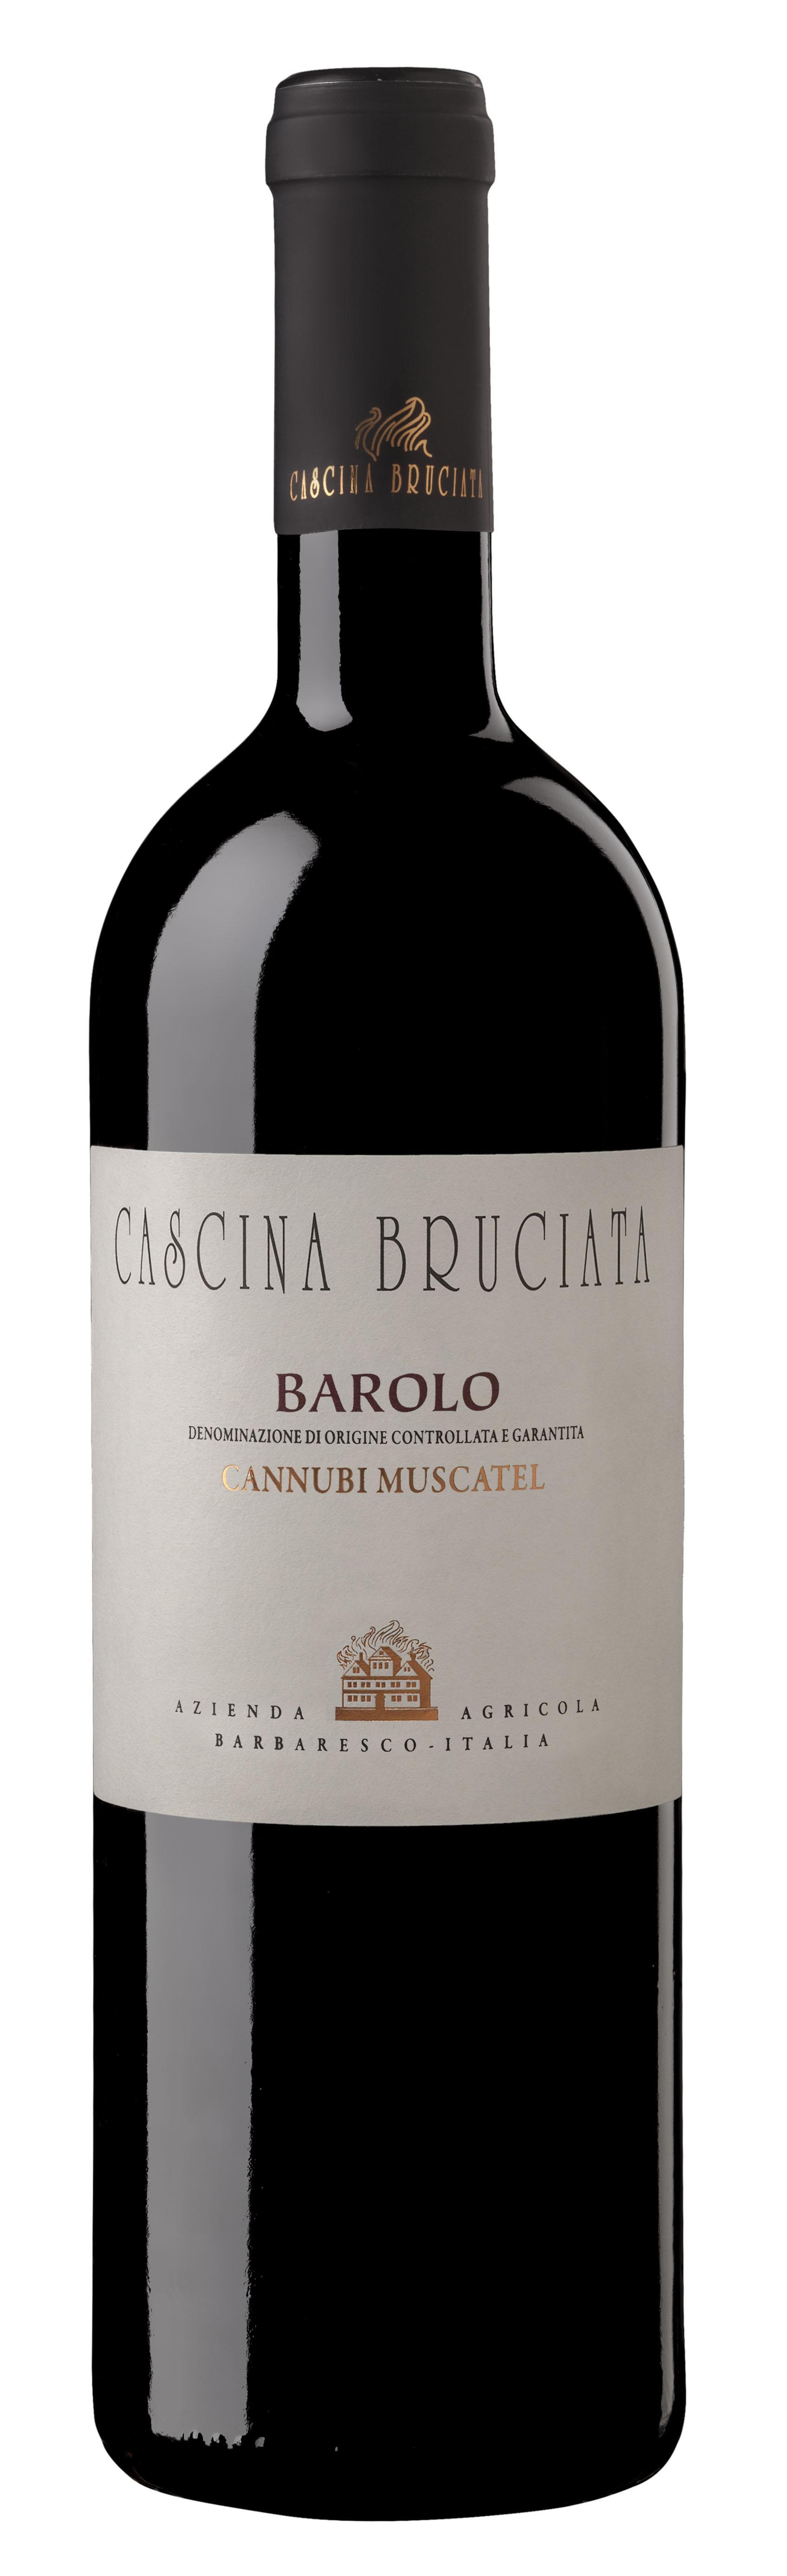 Barolo Cannubi Muscatel